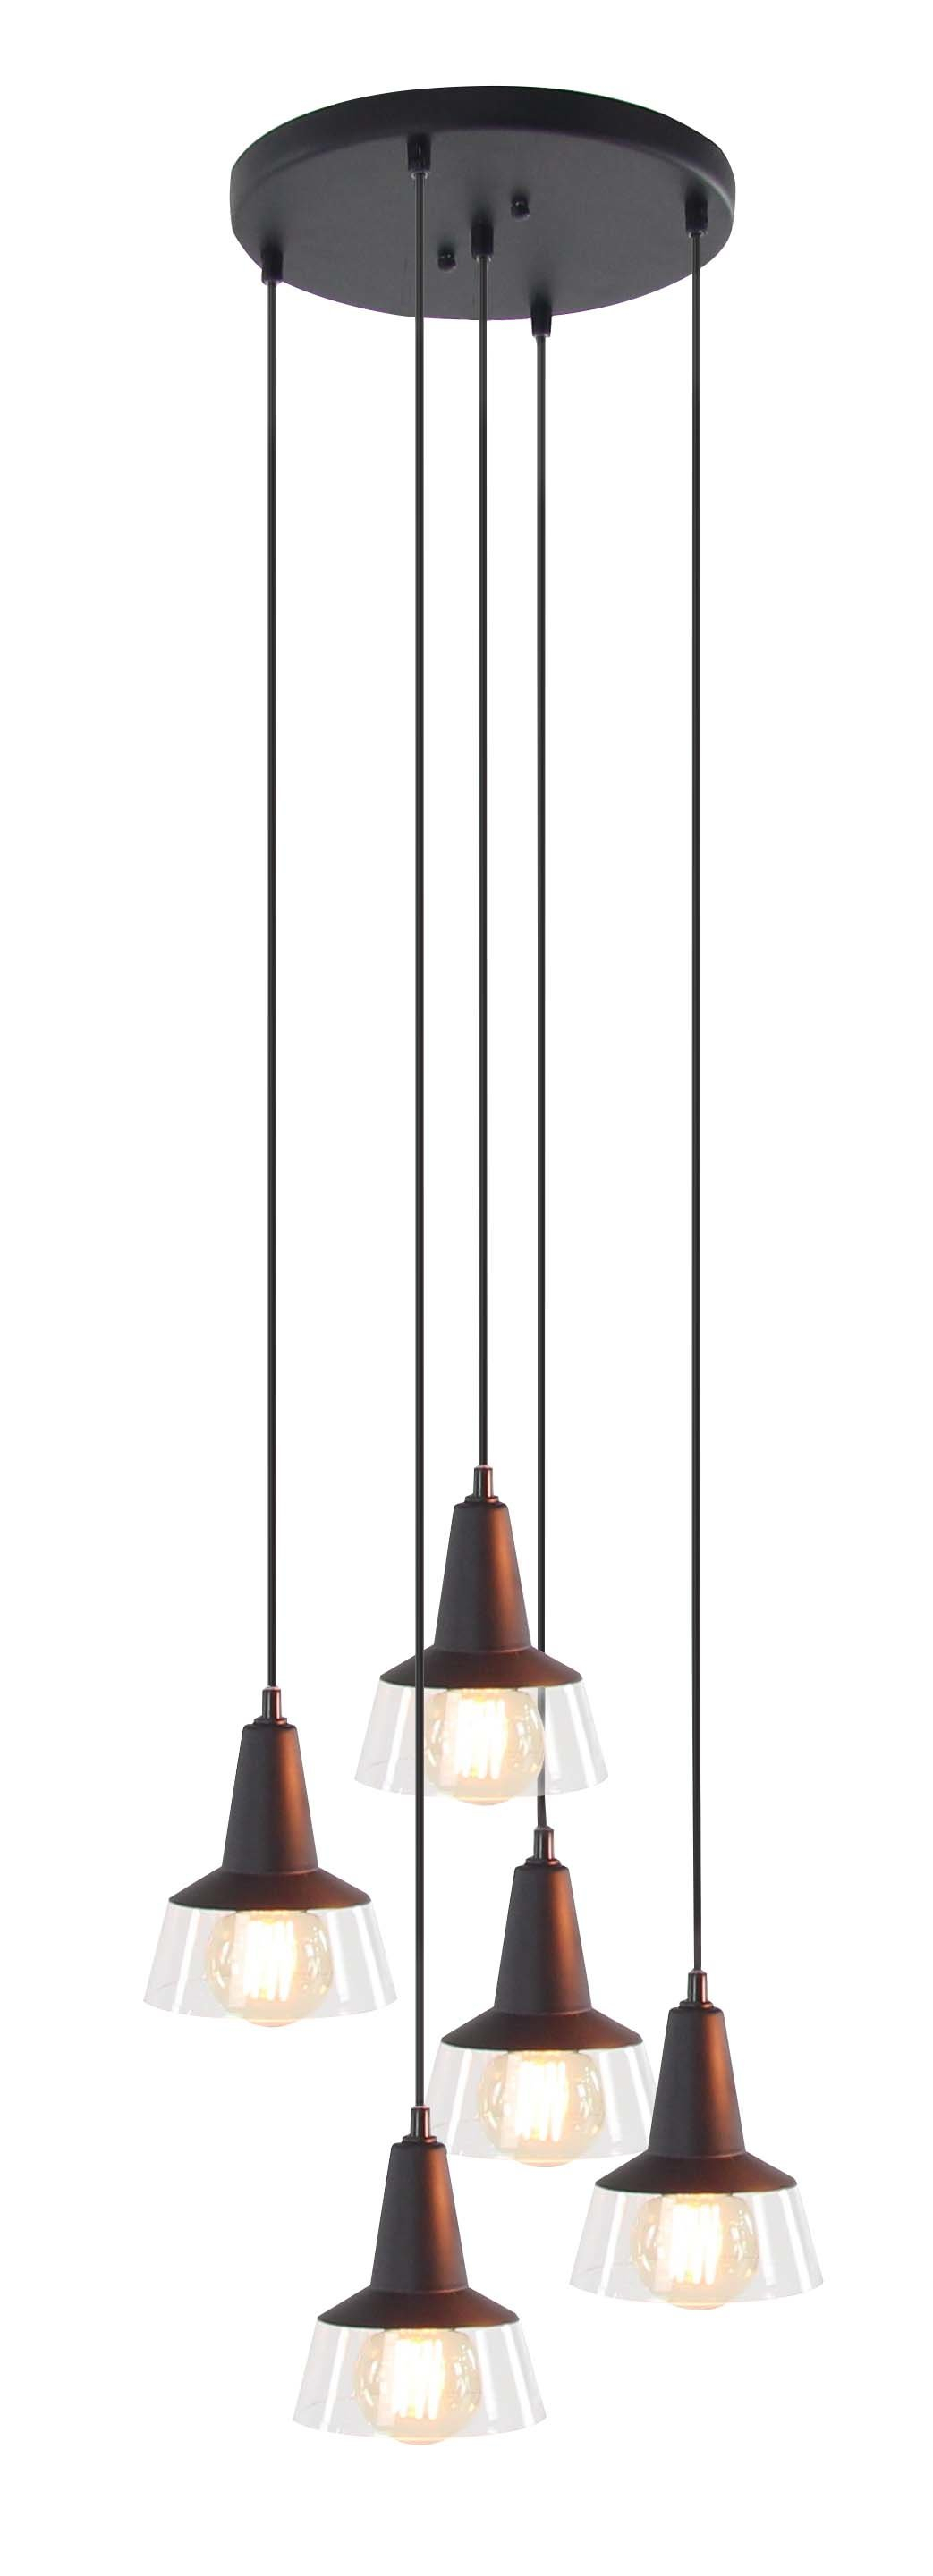 Delia 5 Light Pendant | Wayfair Throughout Balducci 5 Light Pendants (Photo 7 of 30)